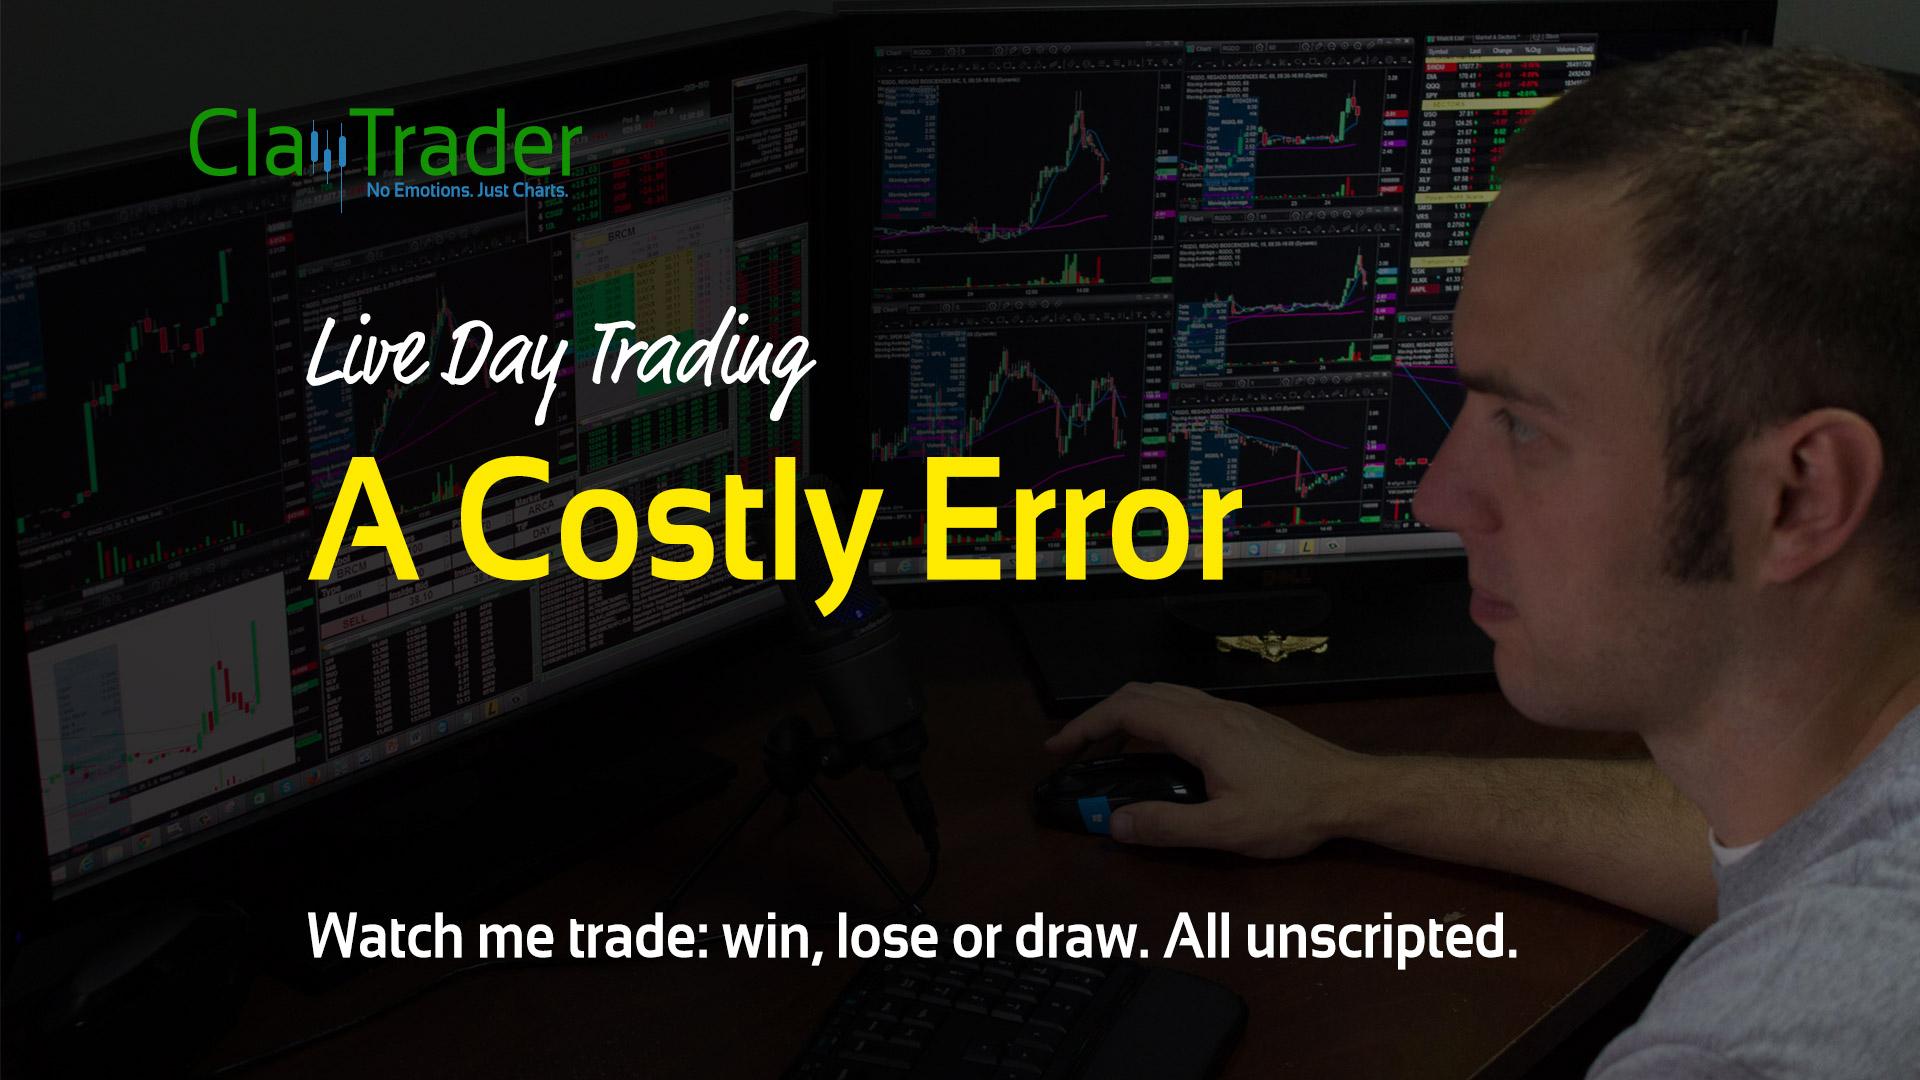 A Costly Error